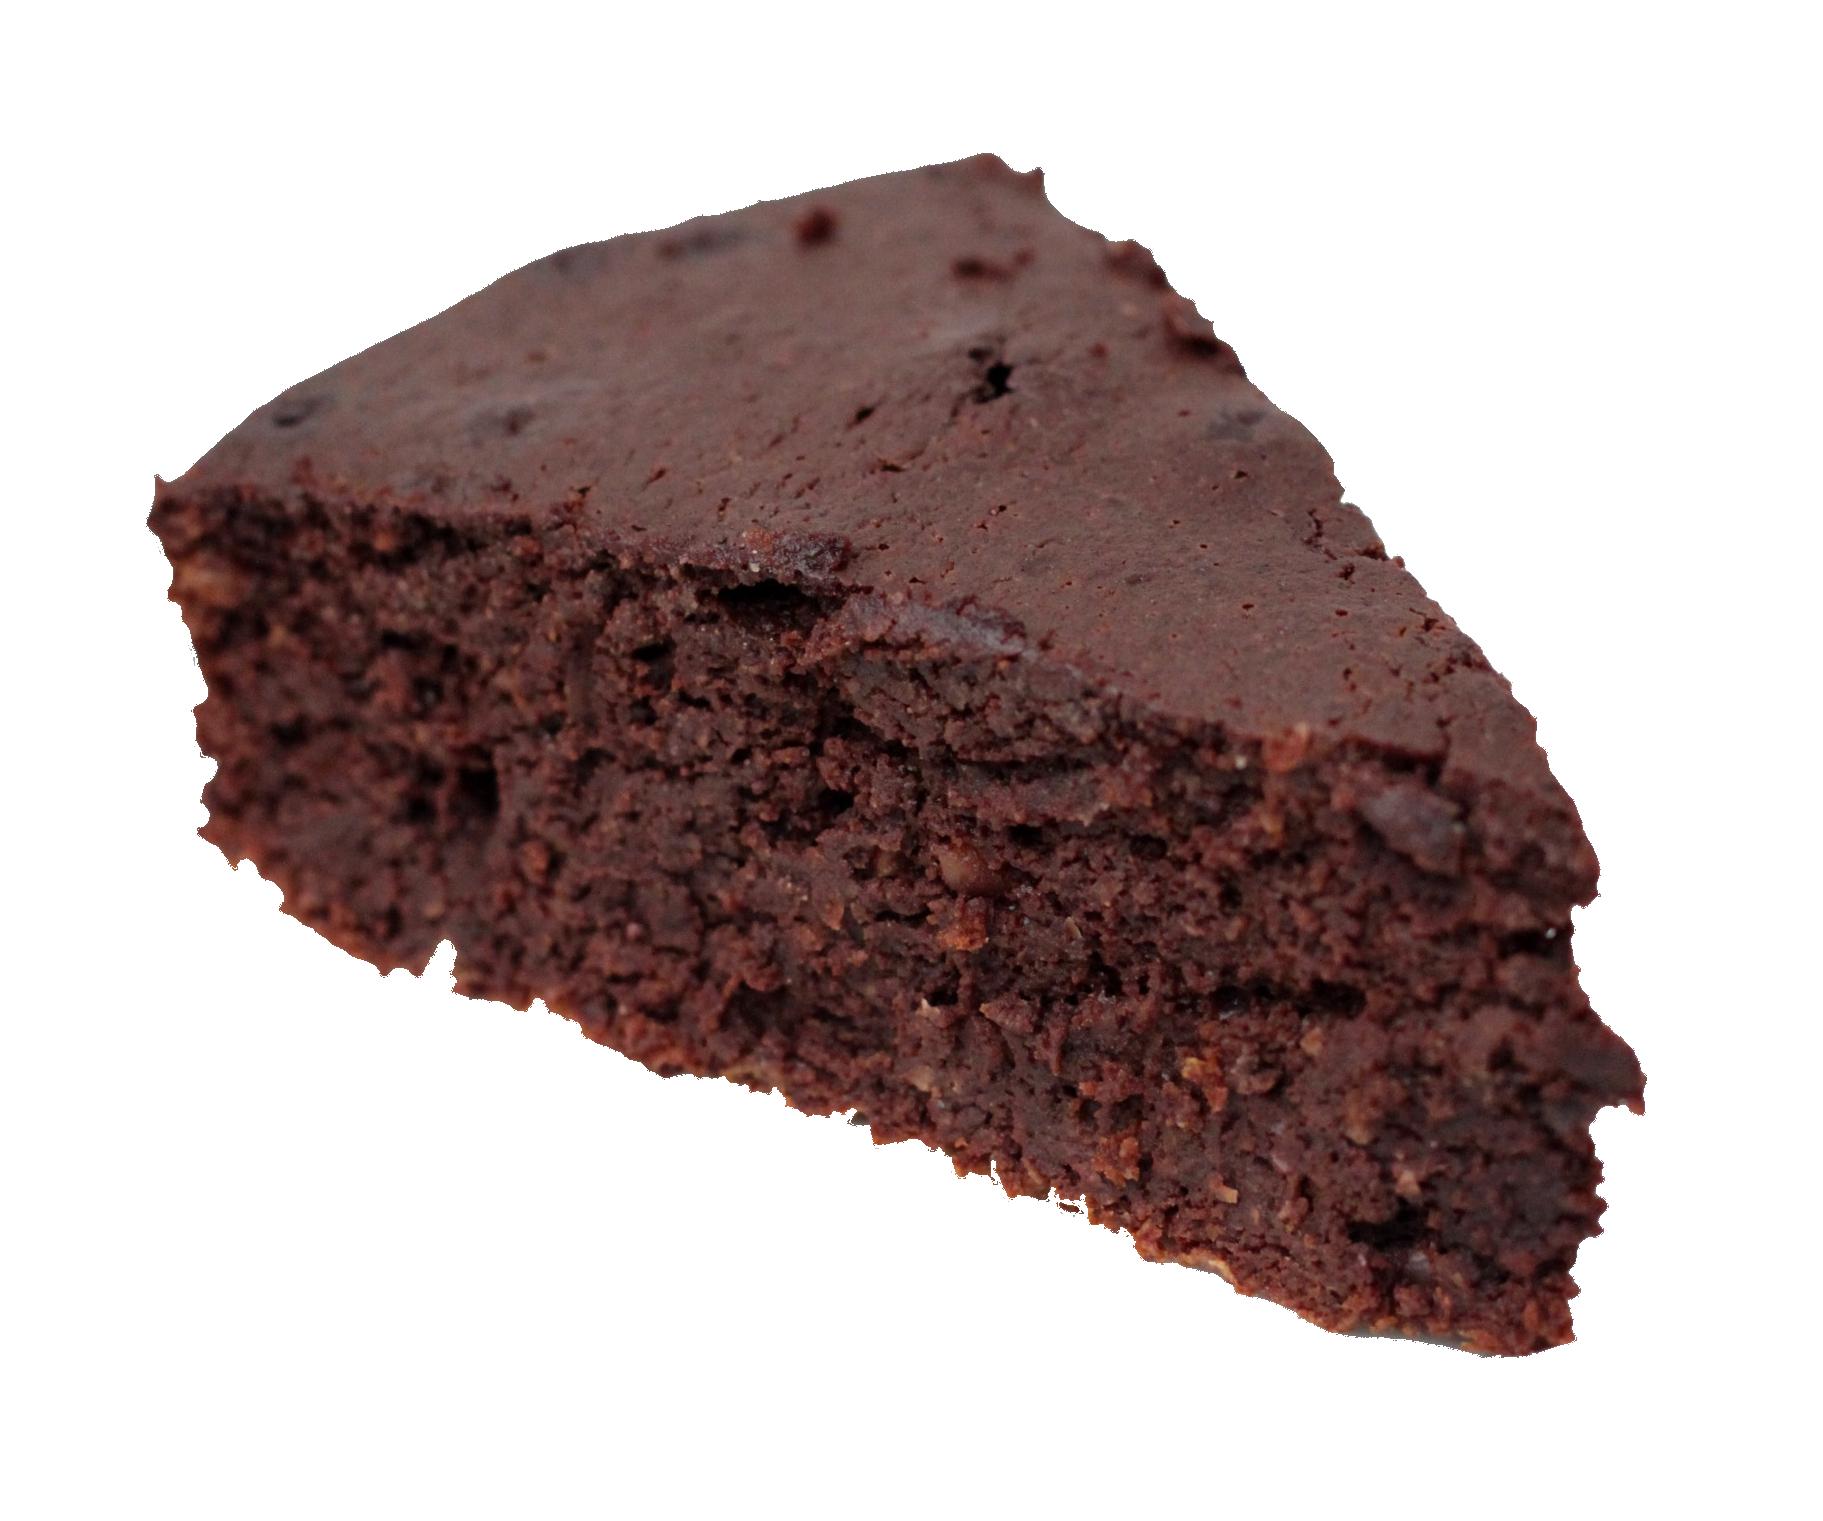 Cake Piece Png Image Cake Desserts Food